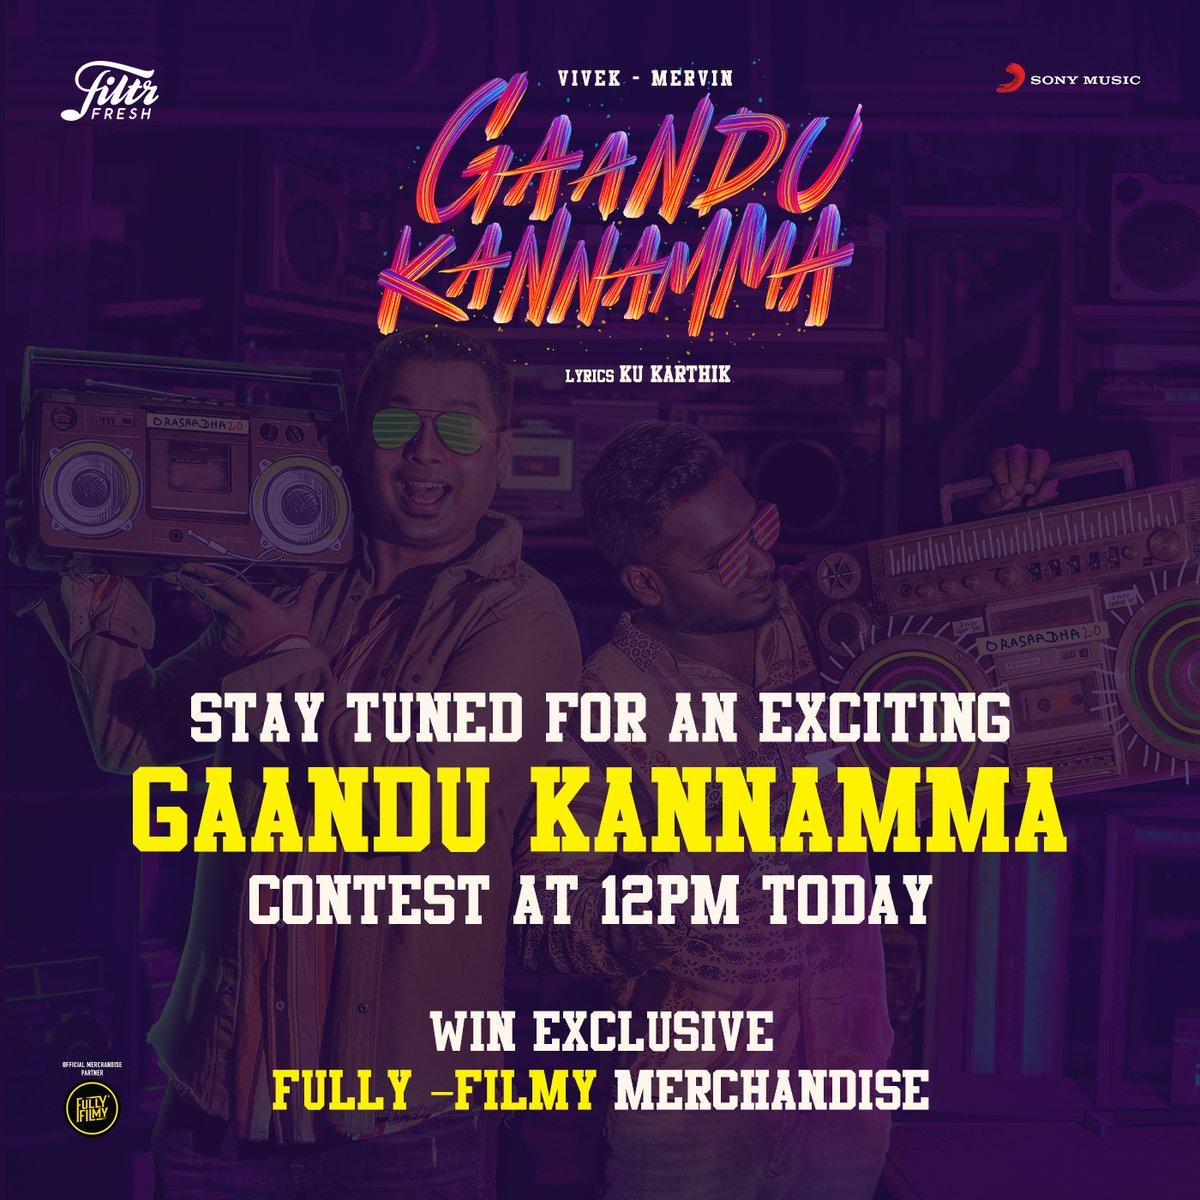 For those of you addicted to #GaanduKannamma watch out for an exclusive #GaanduKannammaContest at 12PM today! 🎉😍  You could win @FullyFilmy_in merchandise! Stay tuned 🥳  ➡️   @iamviveksiva @MervinJSolomon @KuKarthk @amithkrishnan85 @PawanAlex @balaji_u